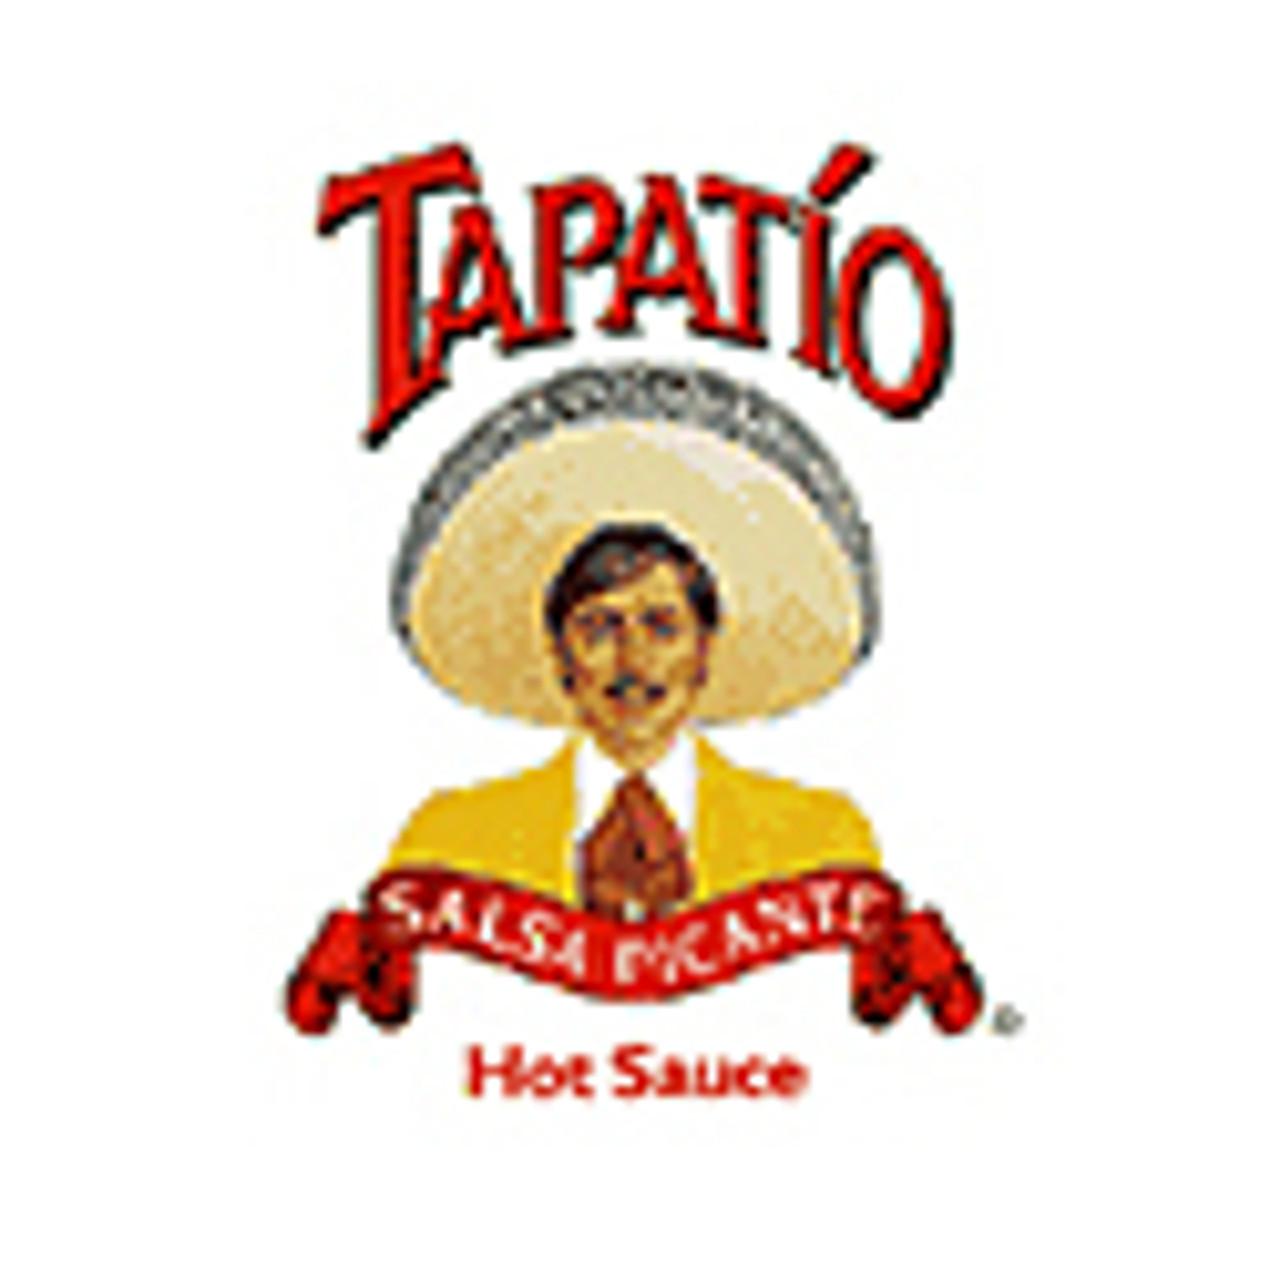 Tapatio Hot Sauce